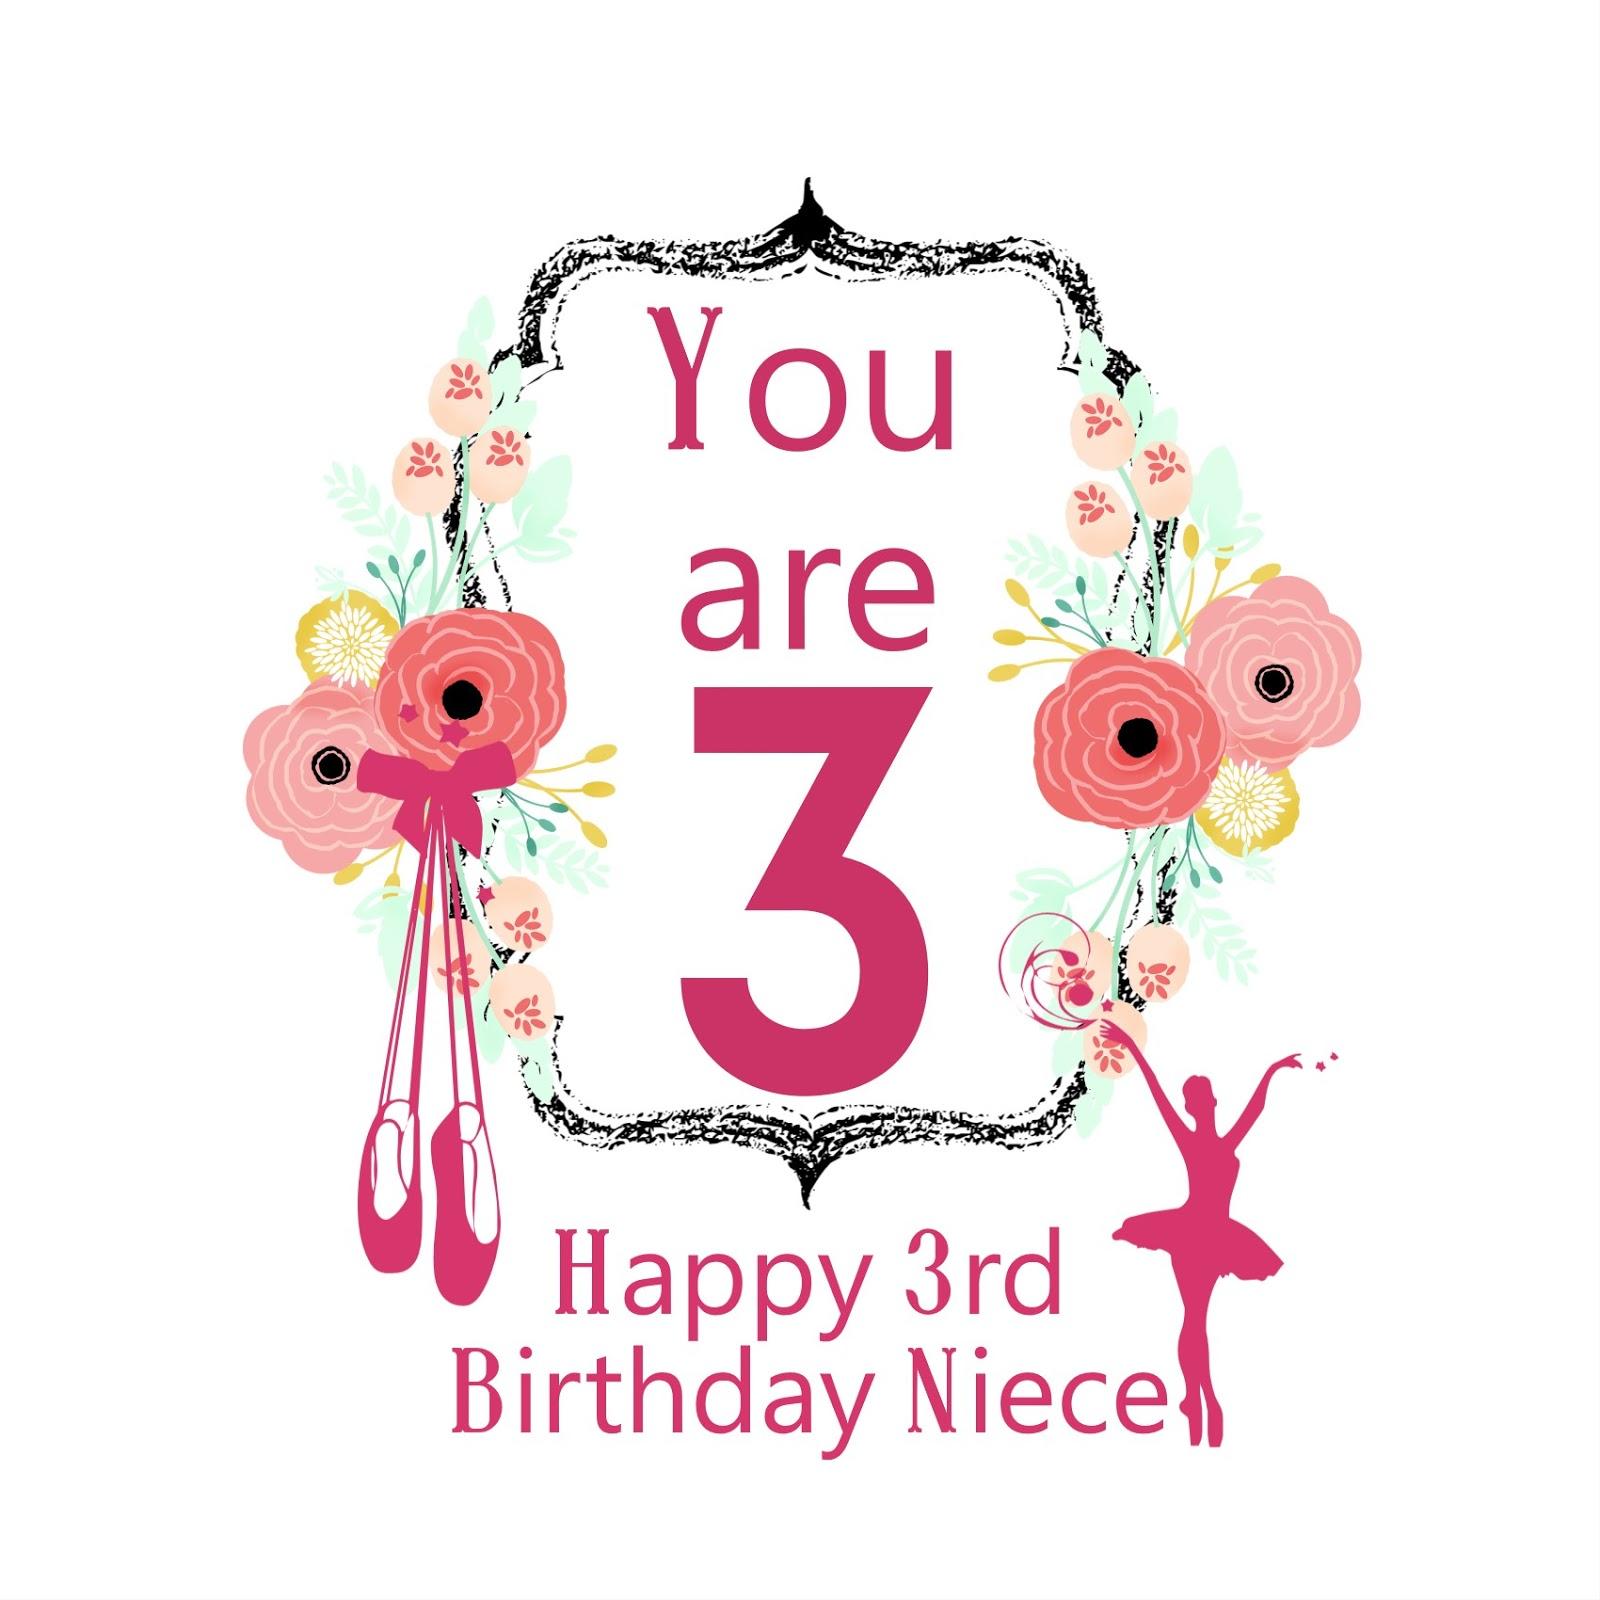 Free Printable Happy 3rd Birthday Niece